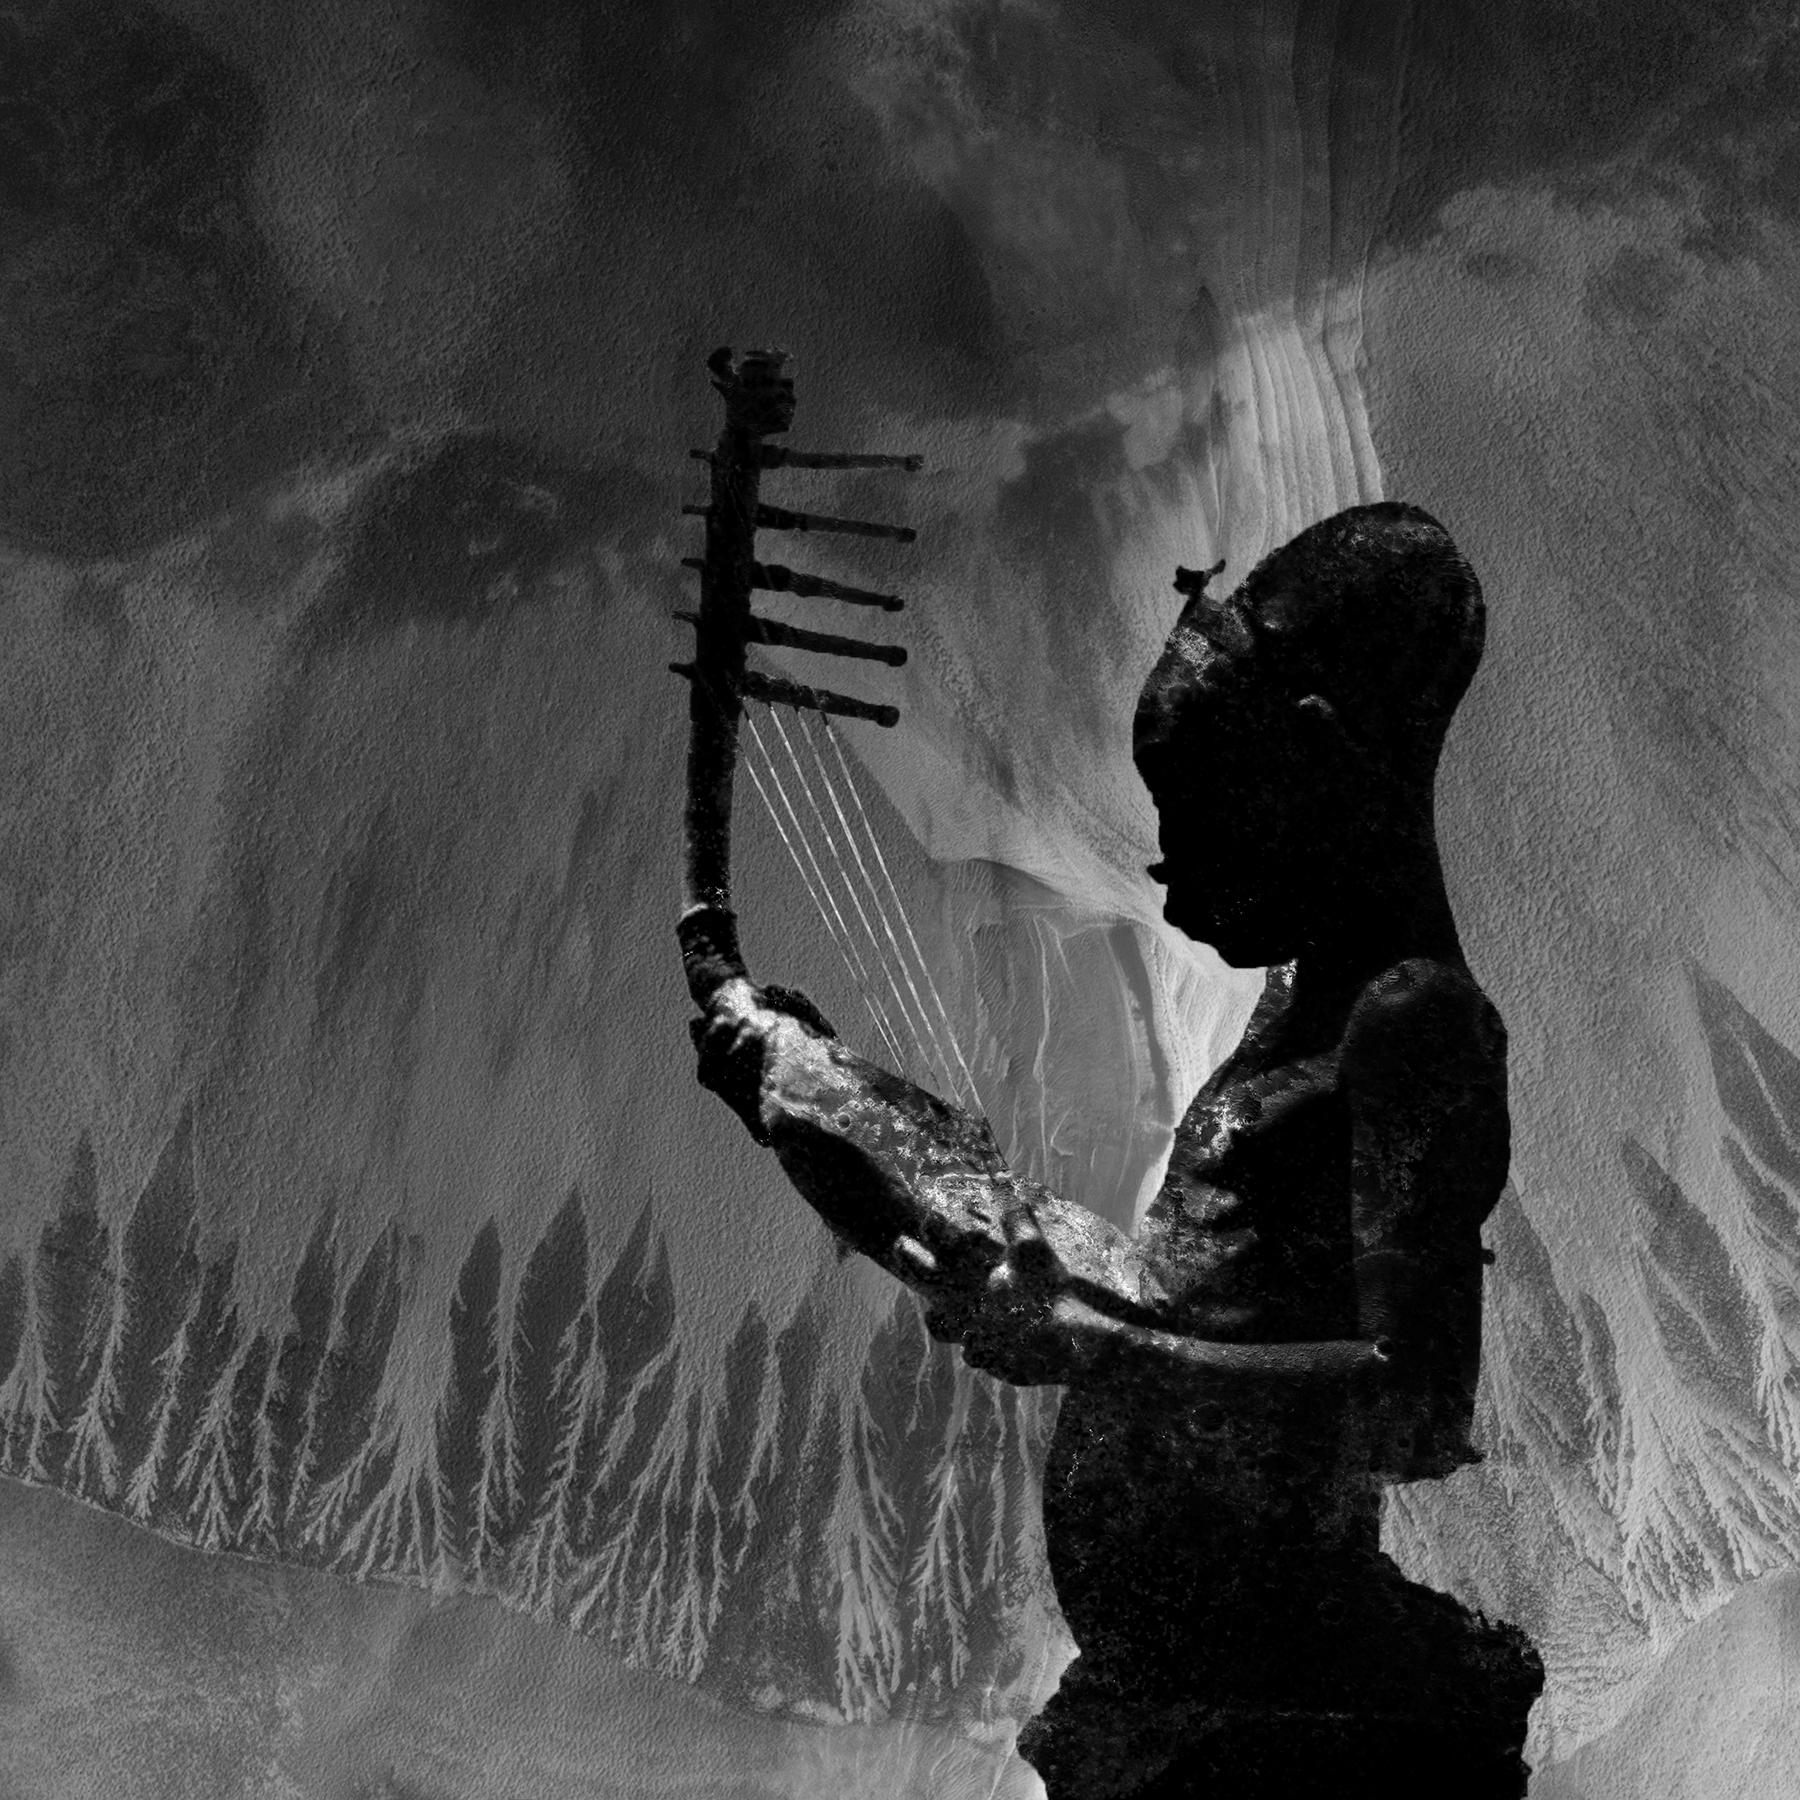 VIEO ABIUNGO - THE DREGS